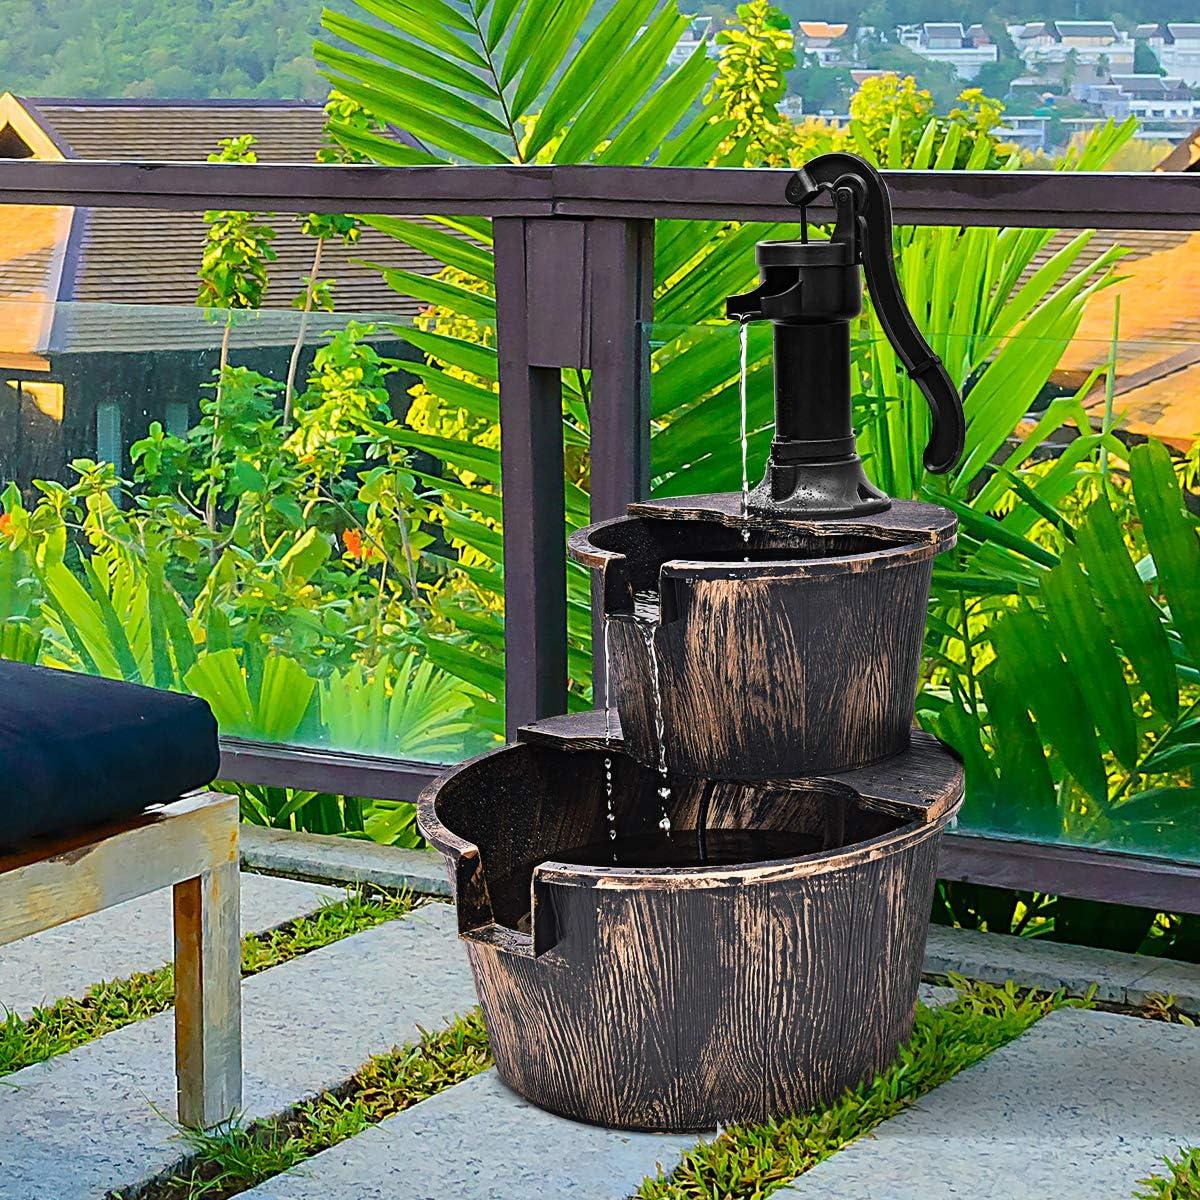 Amazon.com: Giantex - Fuente de agua de madera rústica con ...